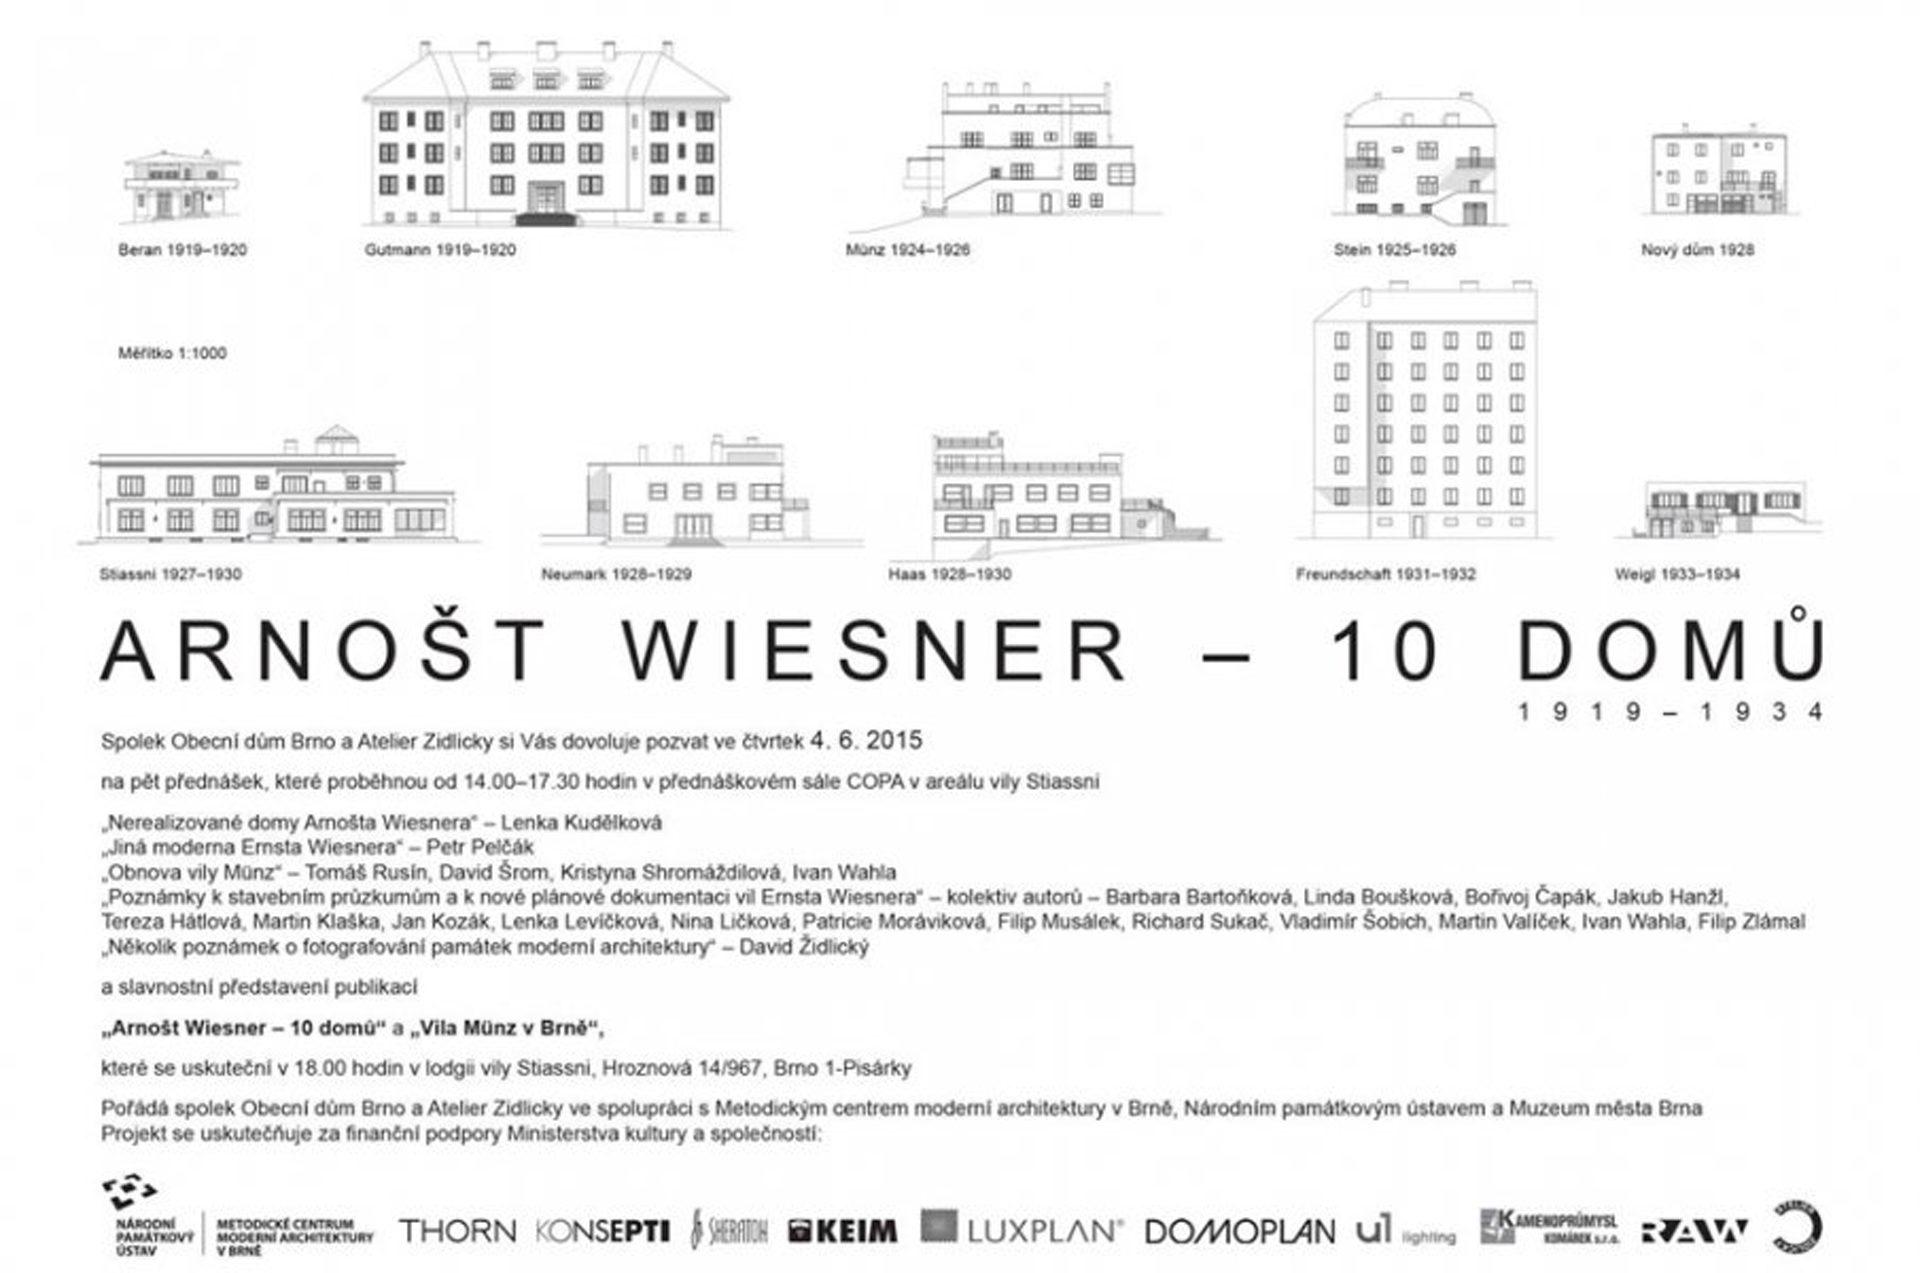 Arnošt Wiesner – 10 domů